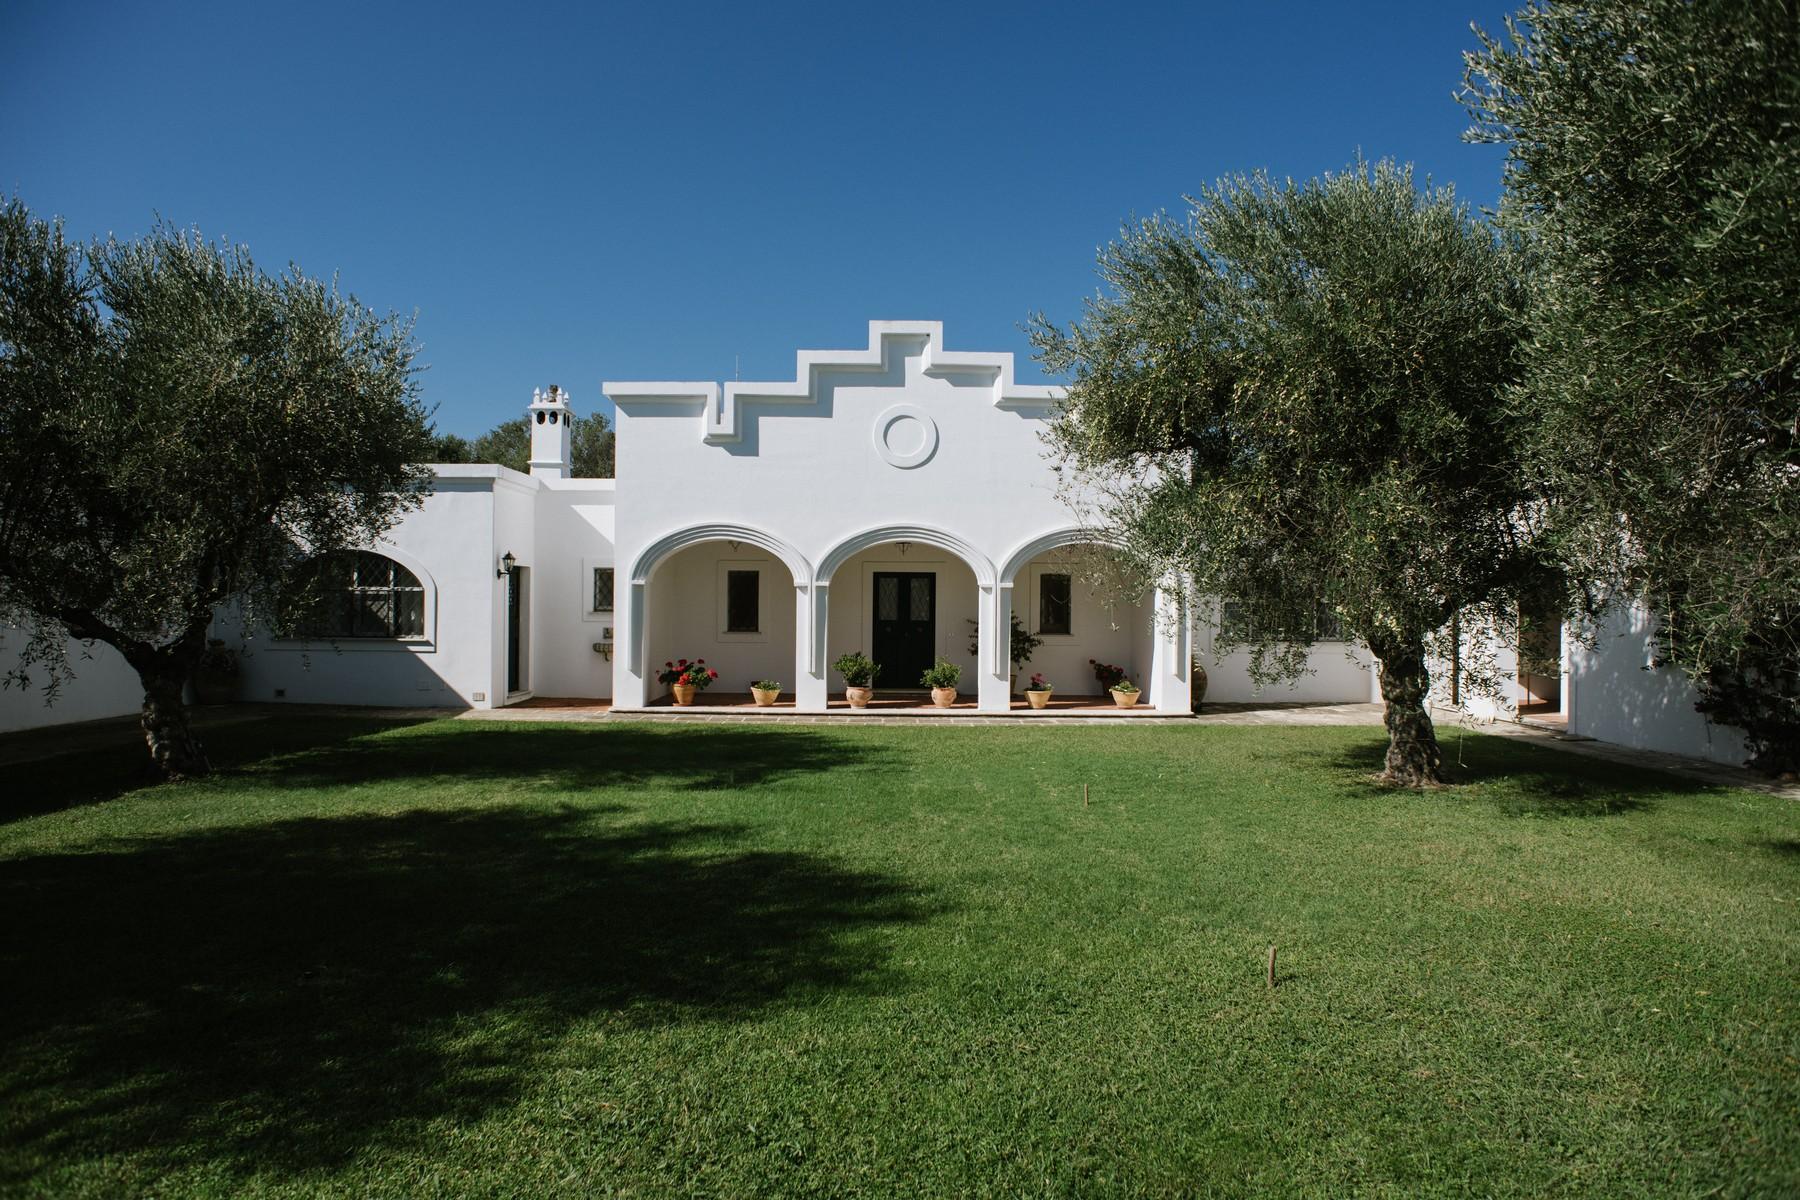 Other Residential Homes for Sale at Capatonno Contrada in Castellaneta Castellaneta, Taranto Italy